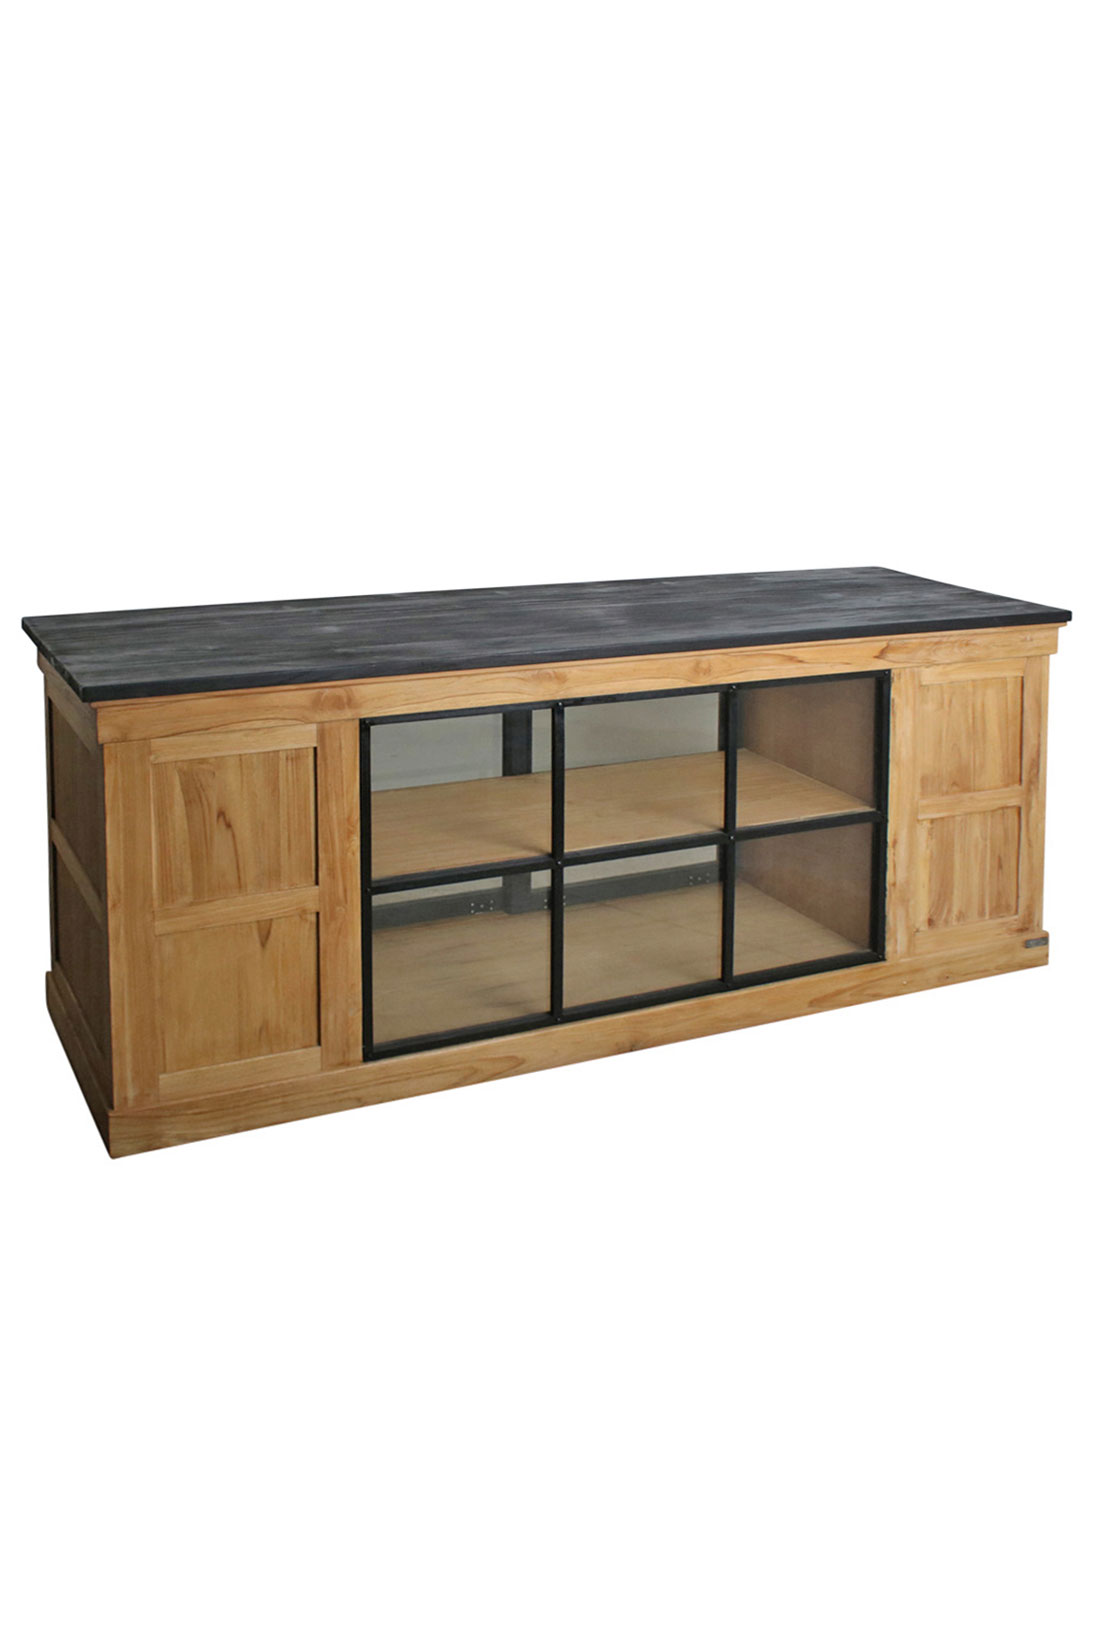 tresen aus recyceltem teakholz natur online kaufen stuff. Black Bedroom Furniture Sets. Home Design Ideas